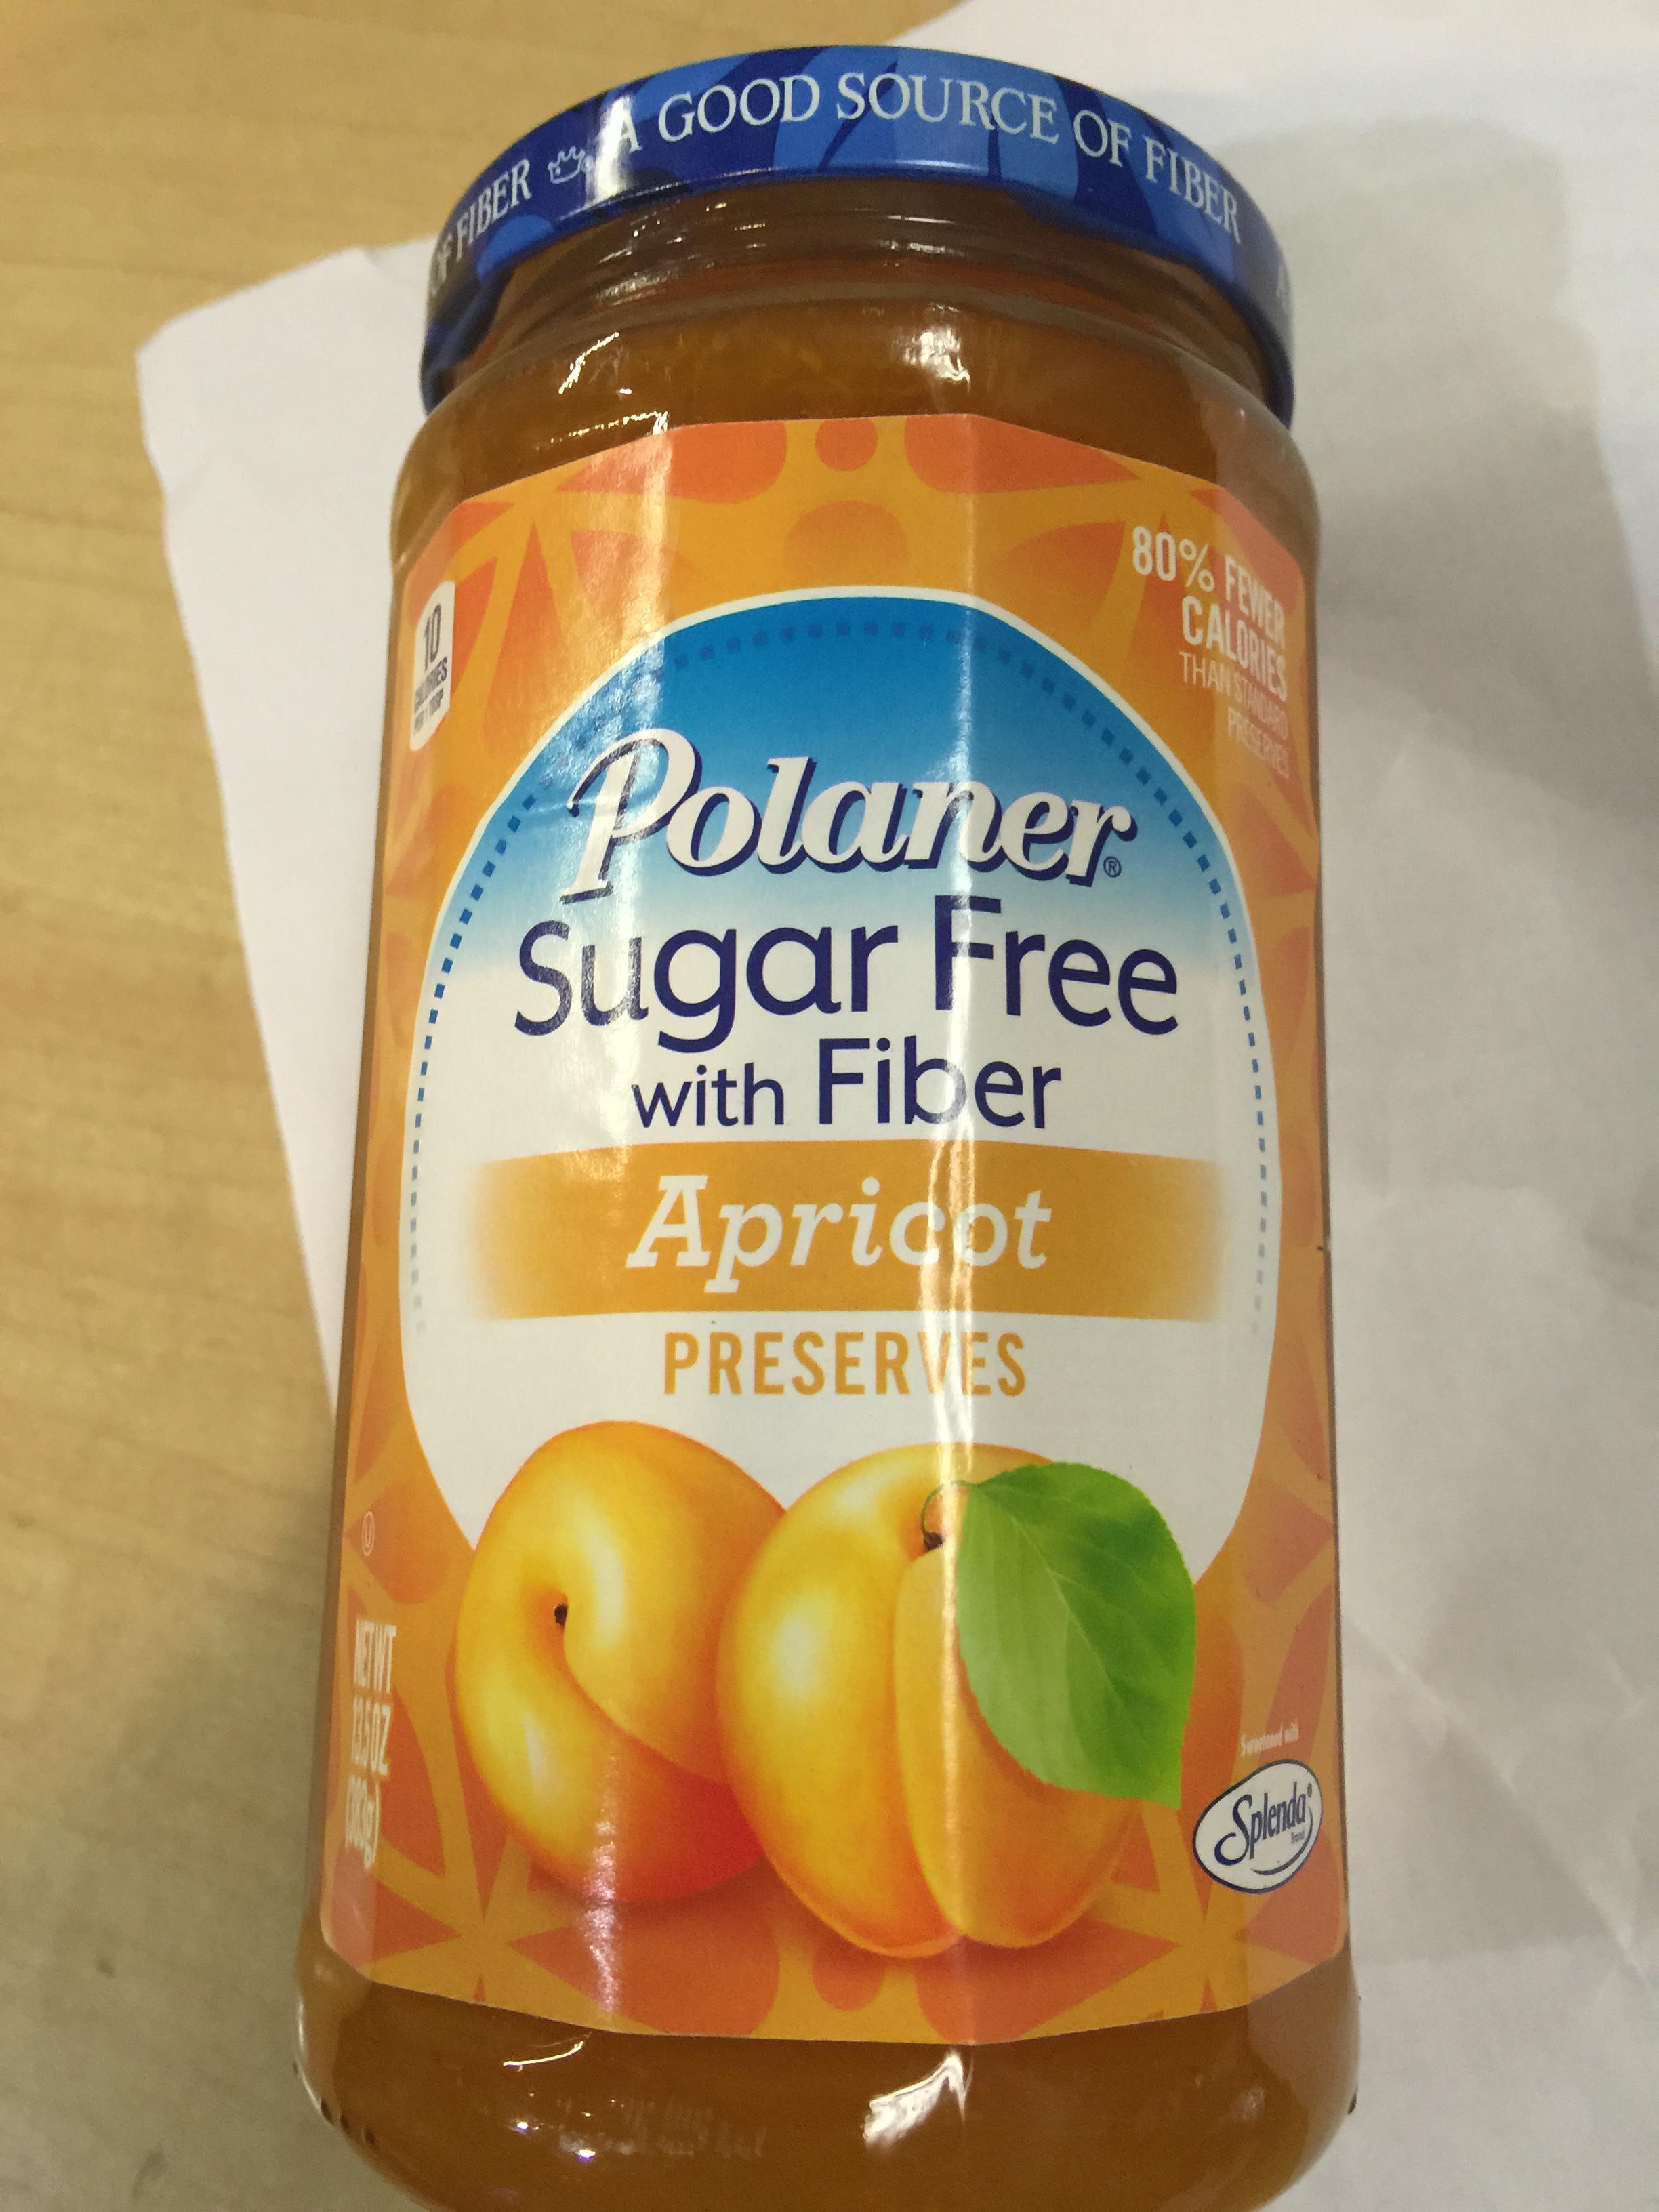 Polaner Sugar Free Apricot Preserves 13.5oz